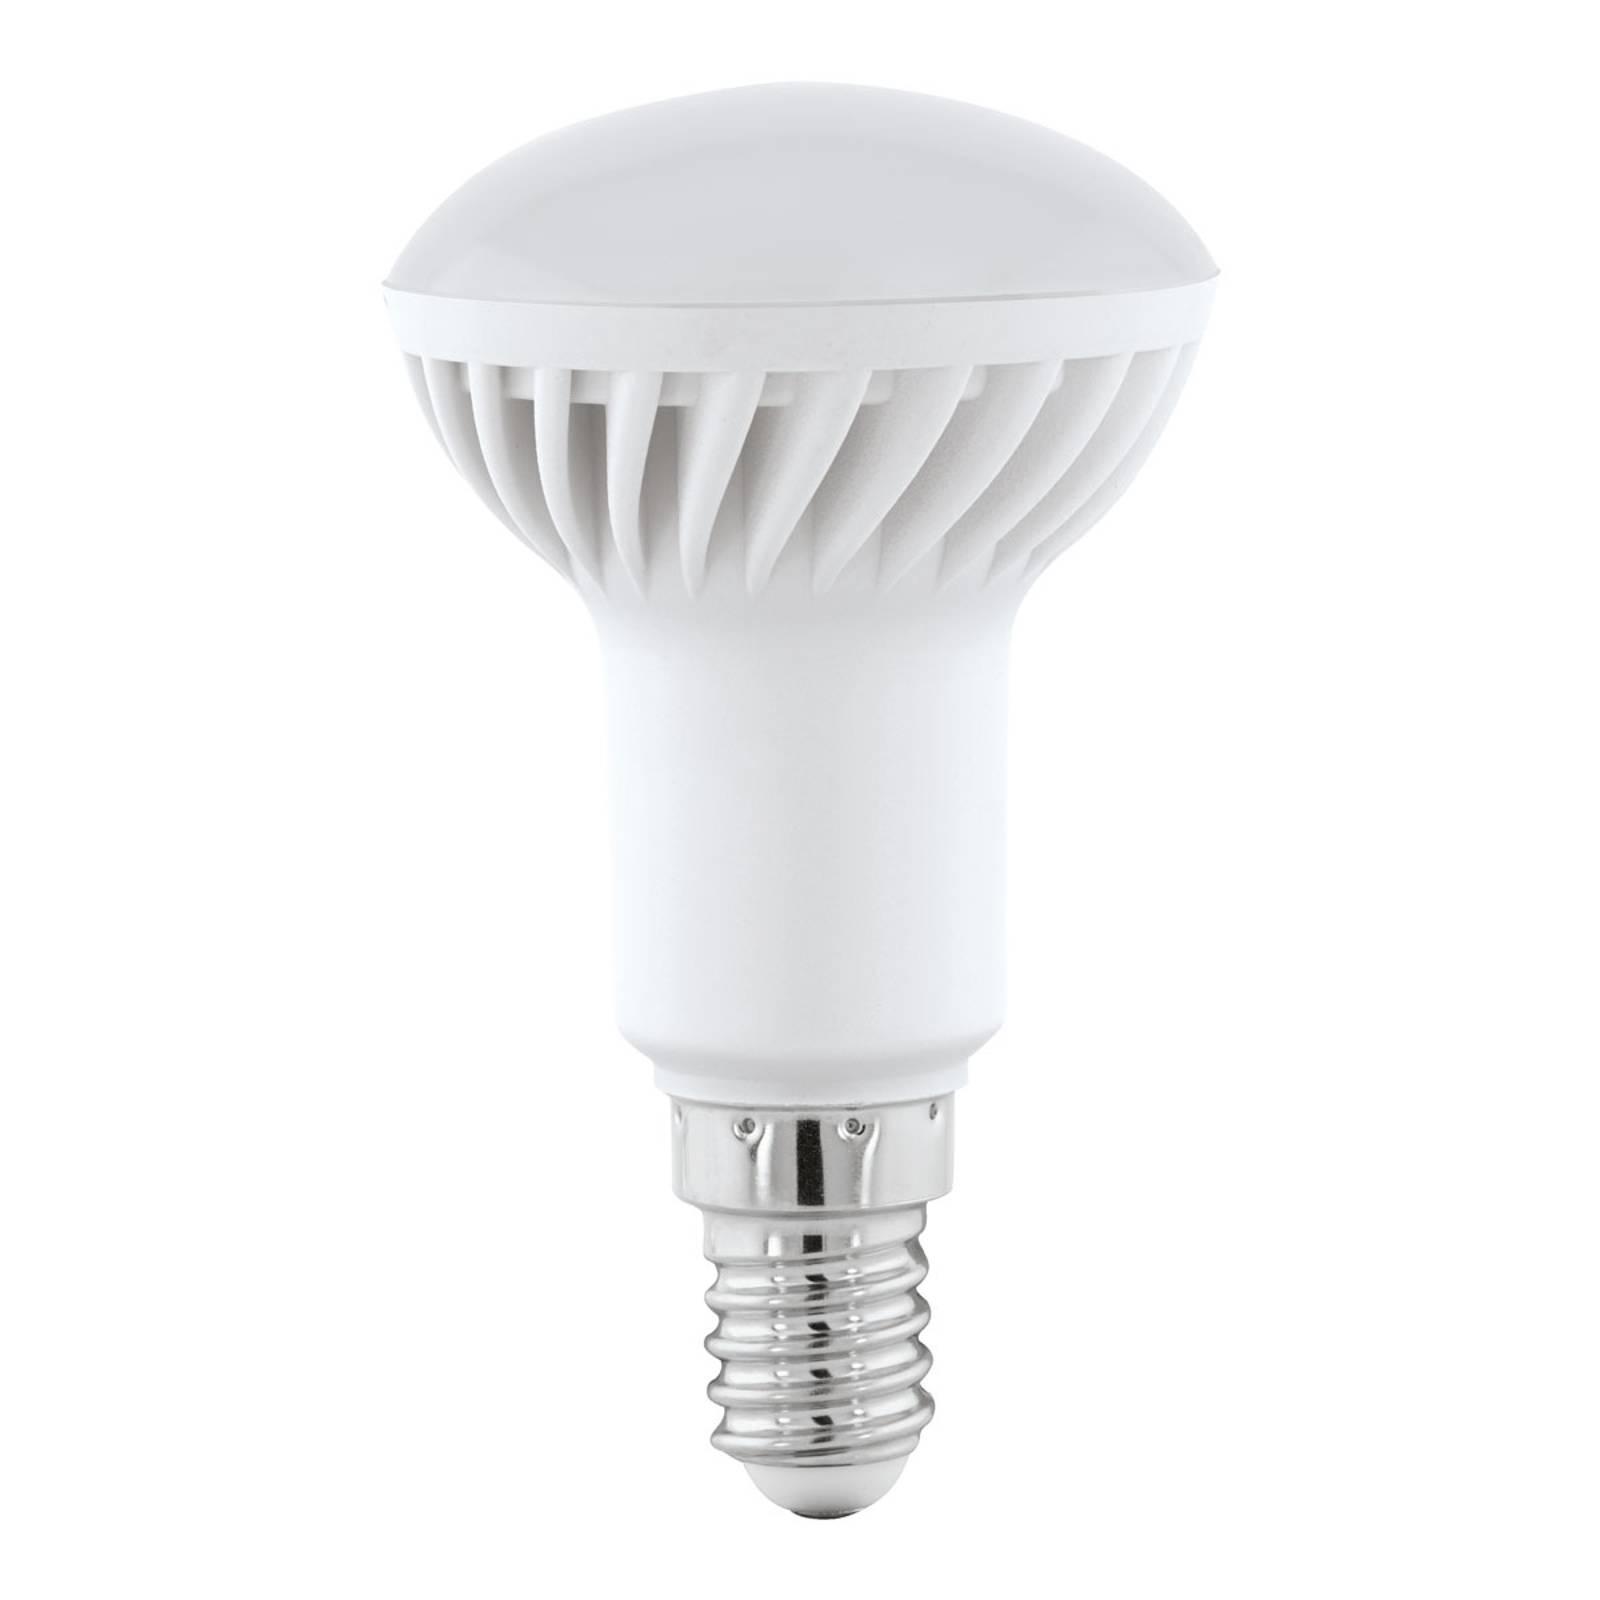 Riflettore LED E14 5W, bianco caldo, satinato